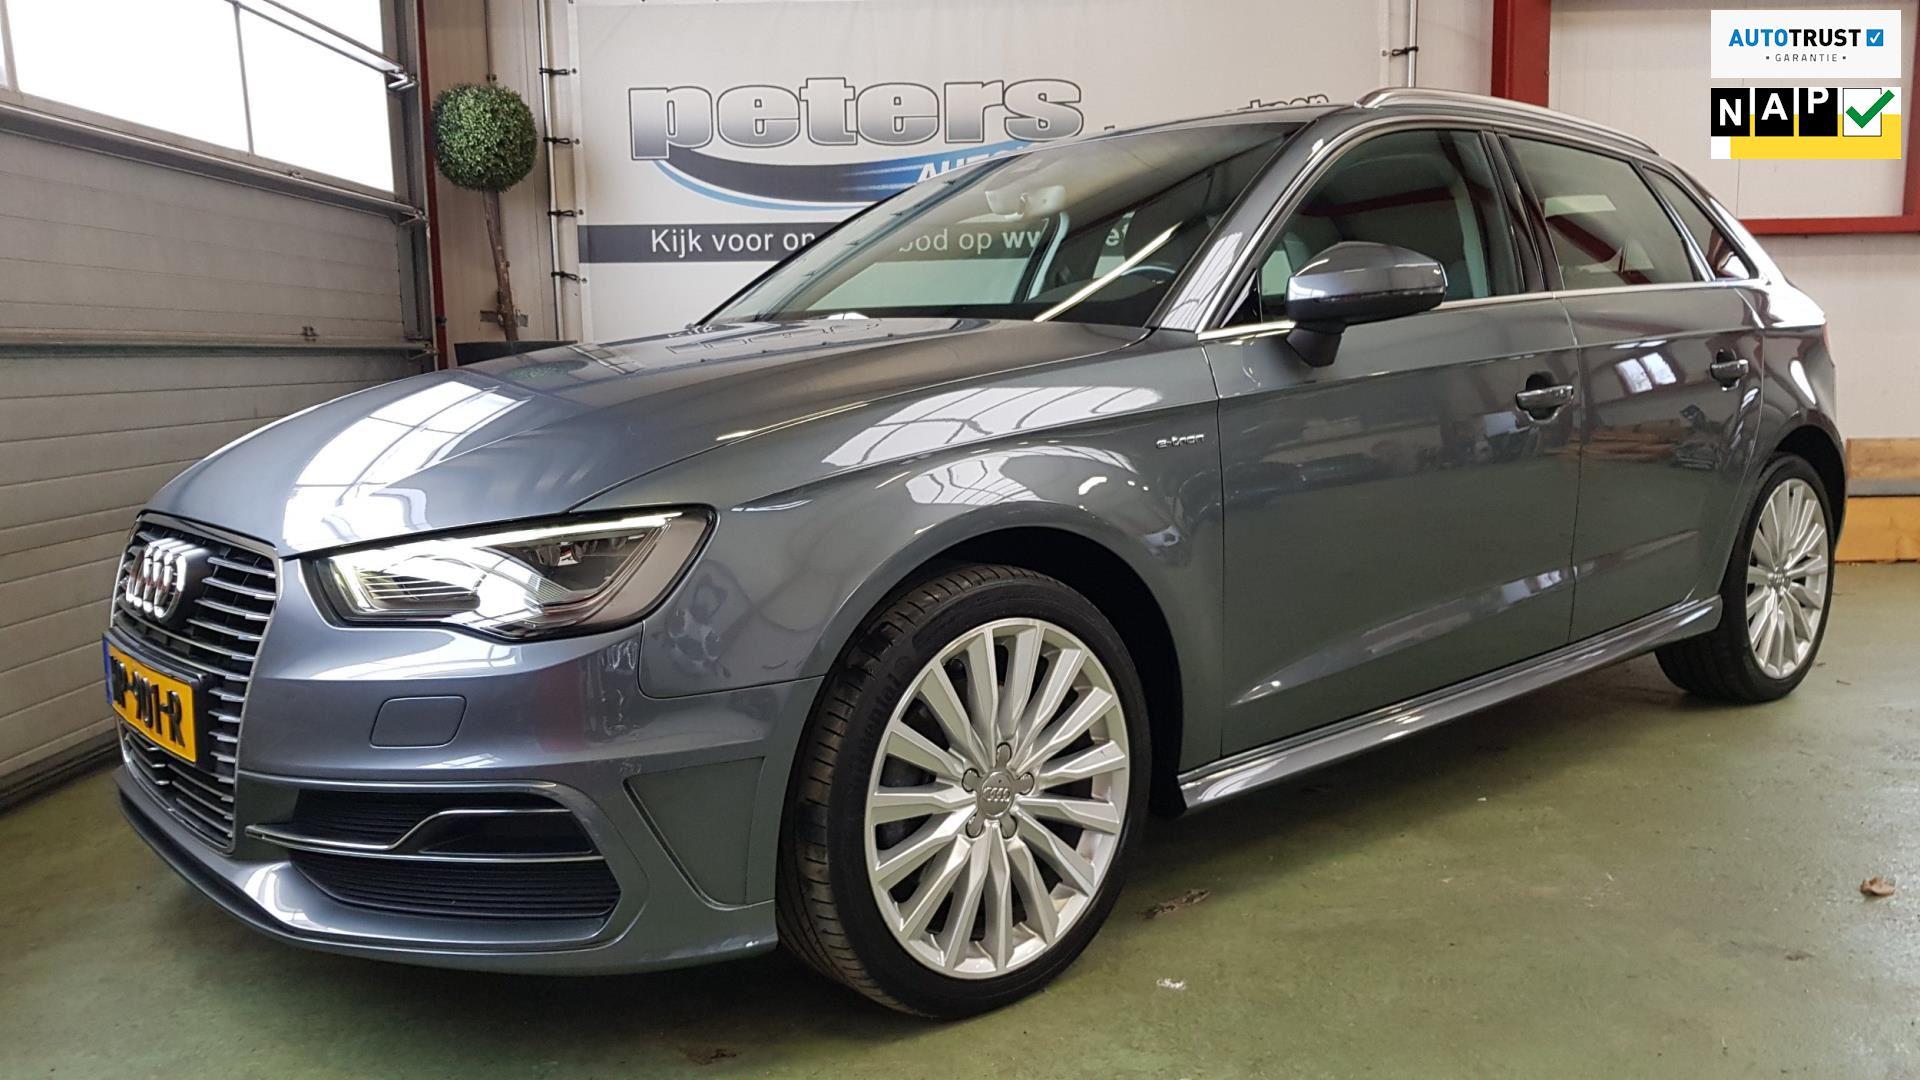 Audi A3 Sportback occasion - Peters Auto's